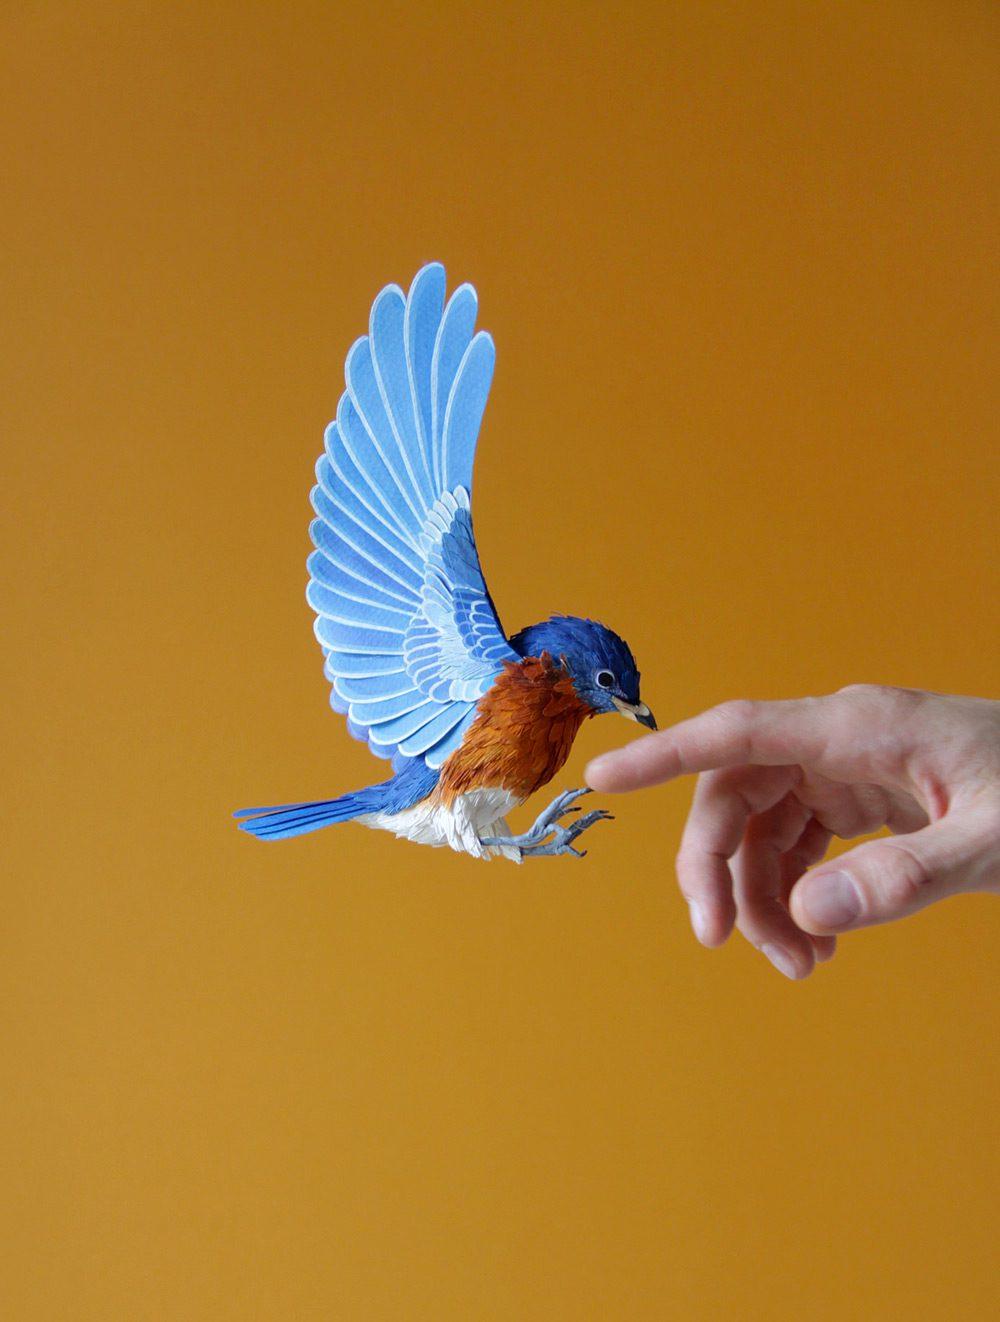 Extraordinary Bird Paper Cut Sculptures By Colombian Artist And Designer Diana Beltran Herrera 6